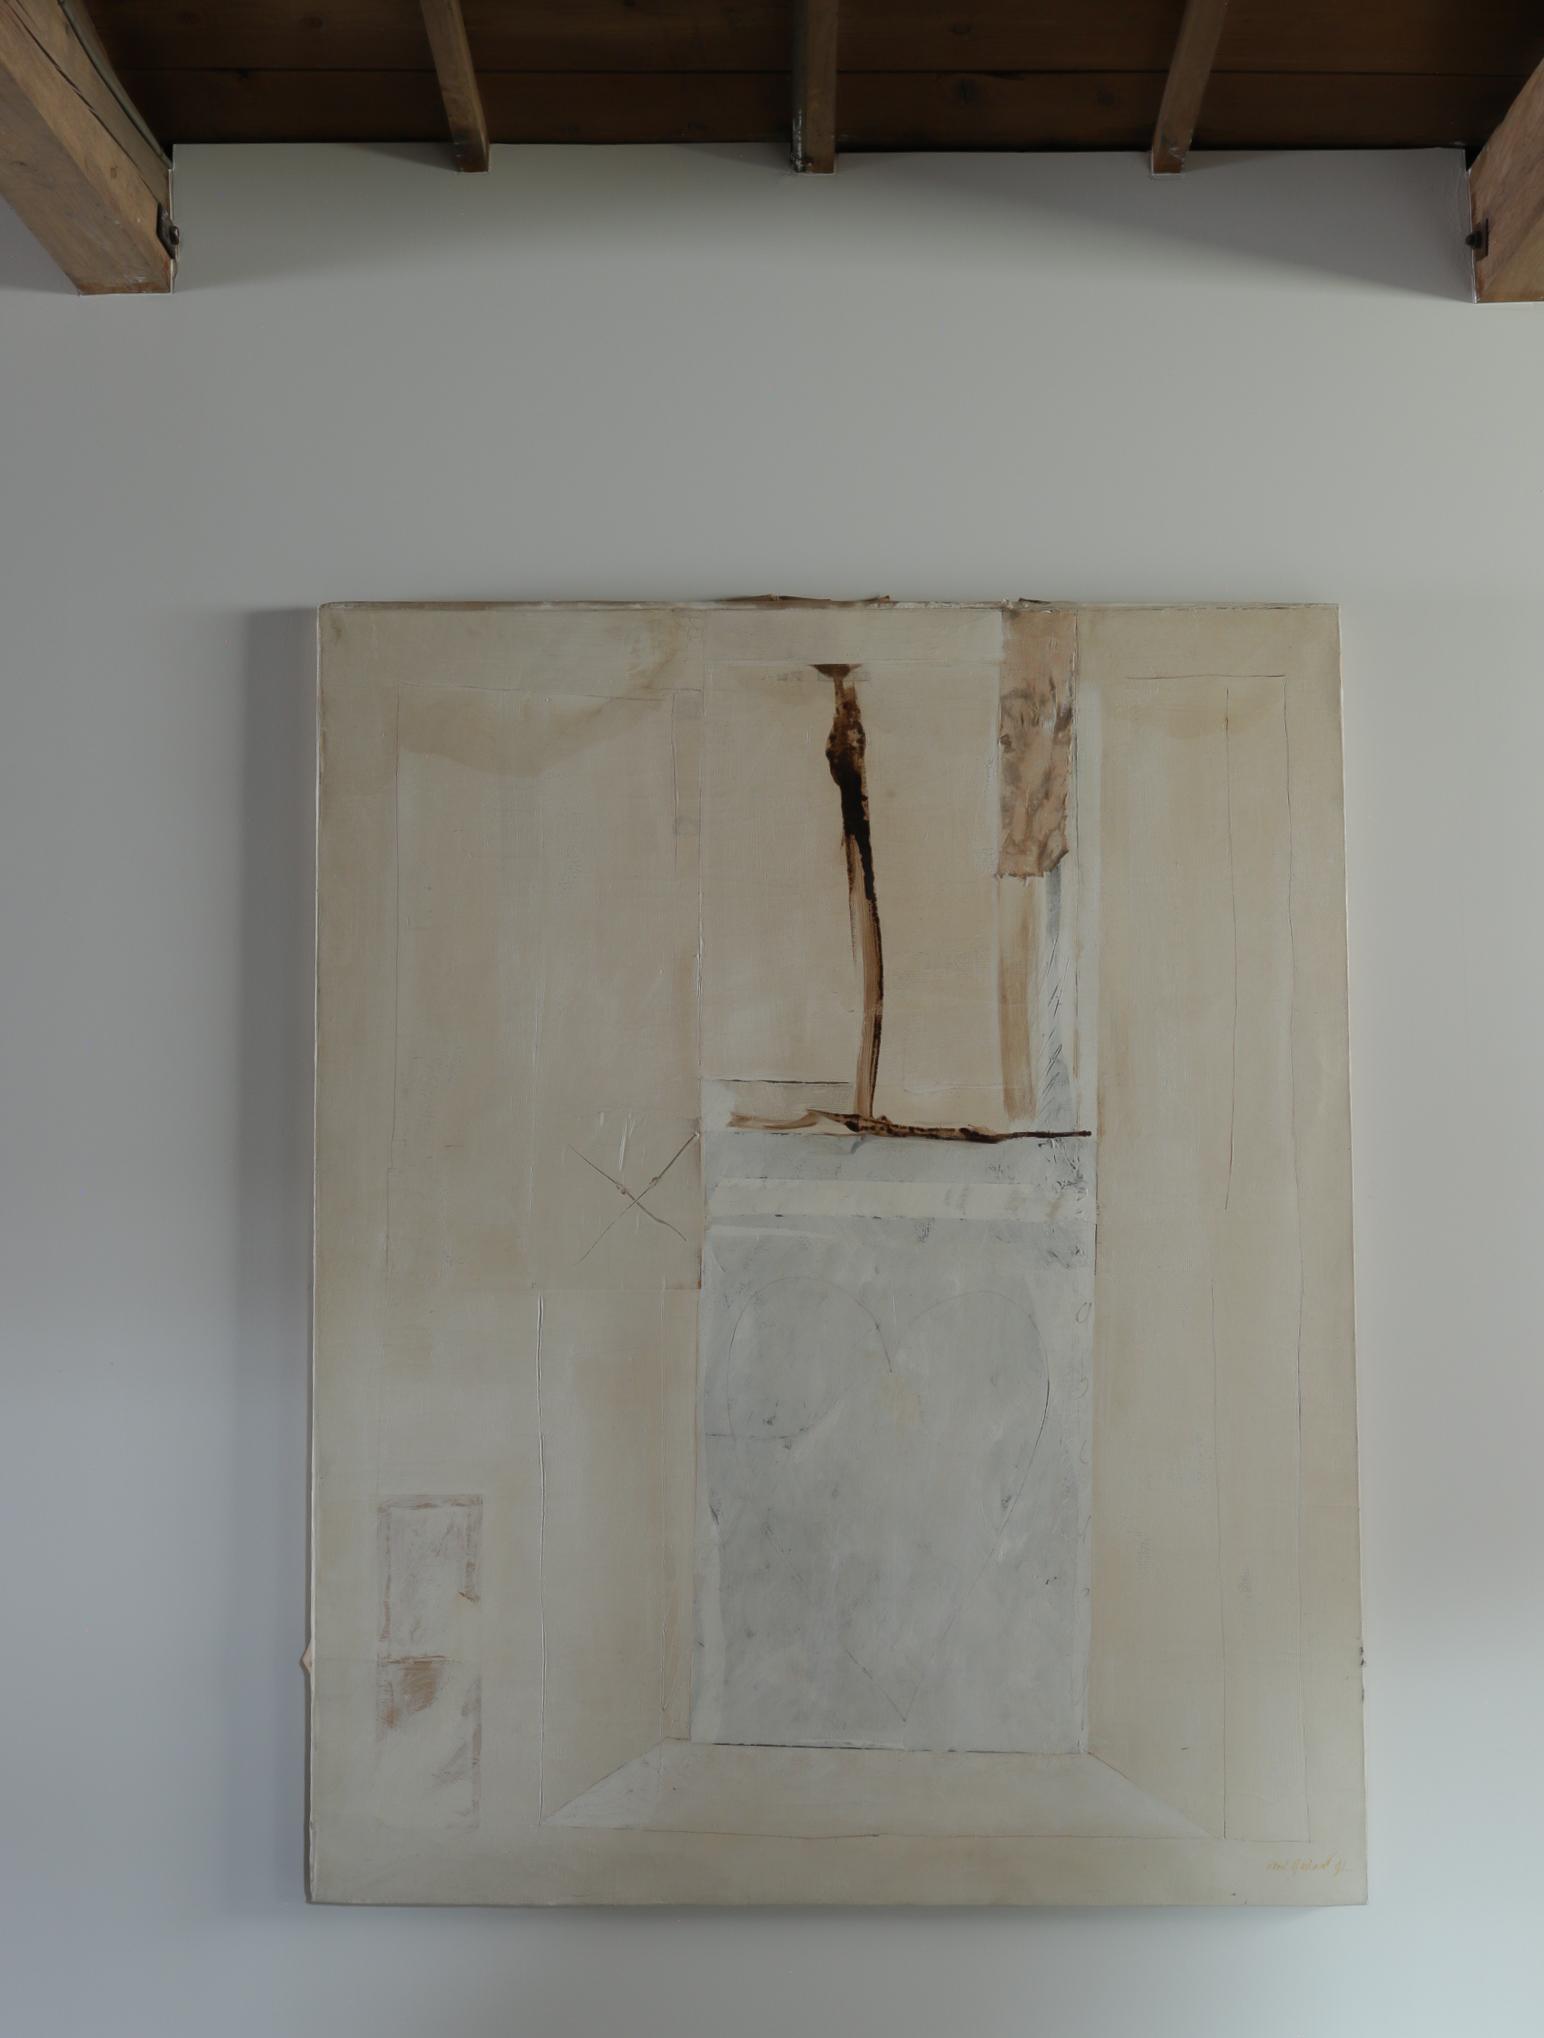 Untitled 1990